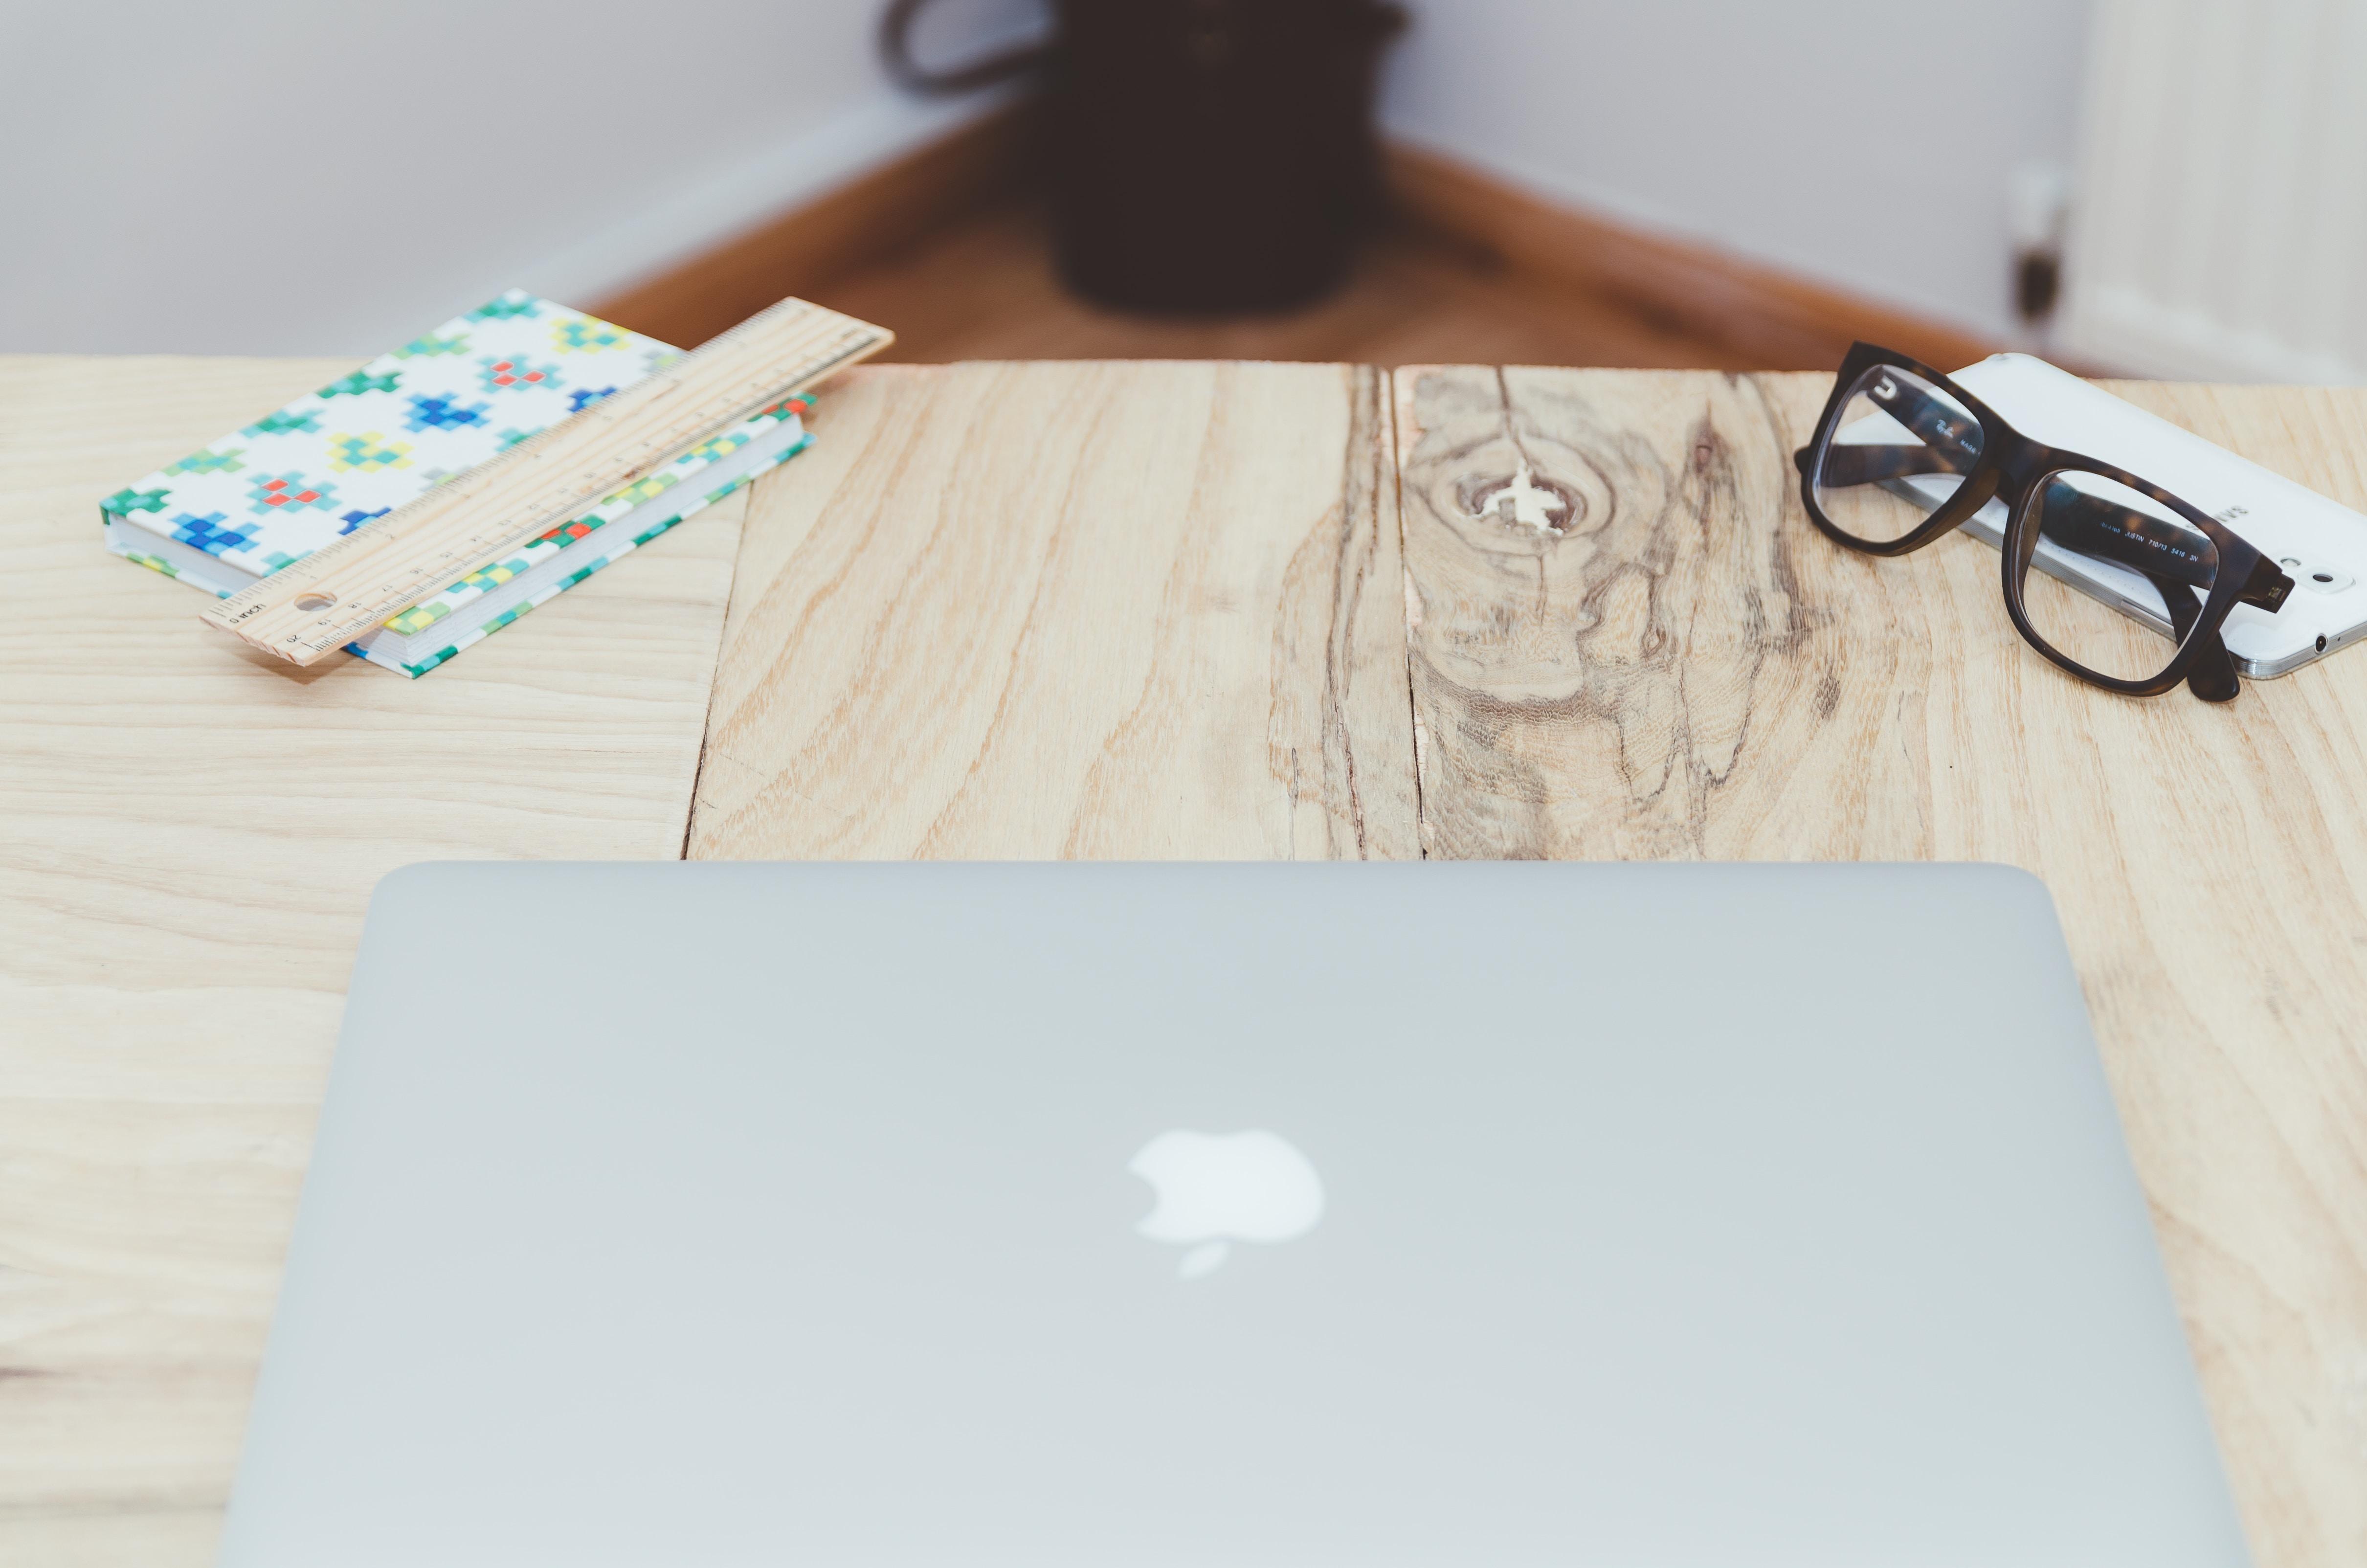 silver MacBook on beige table